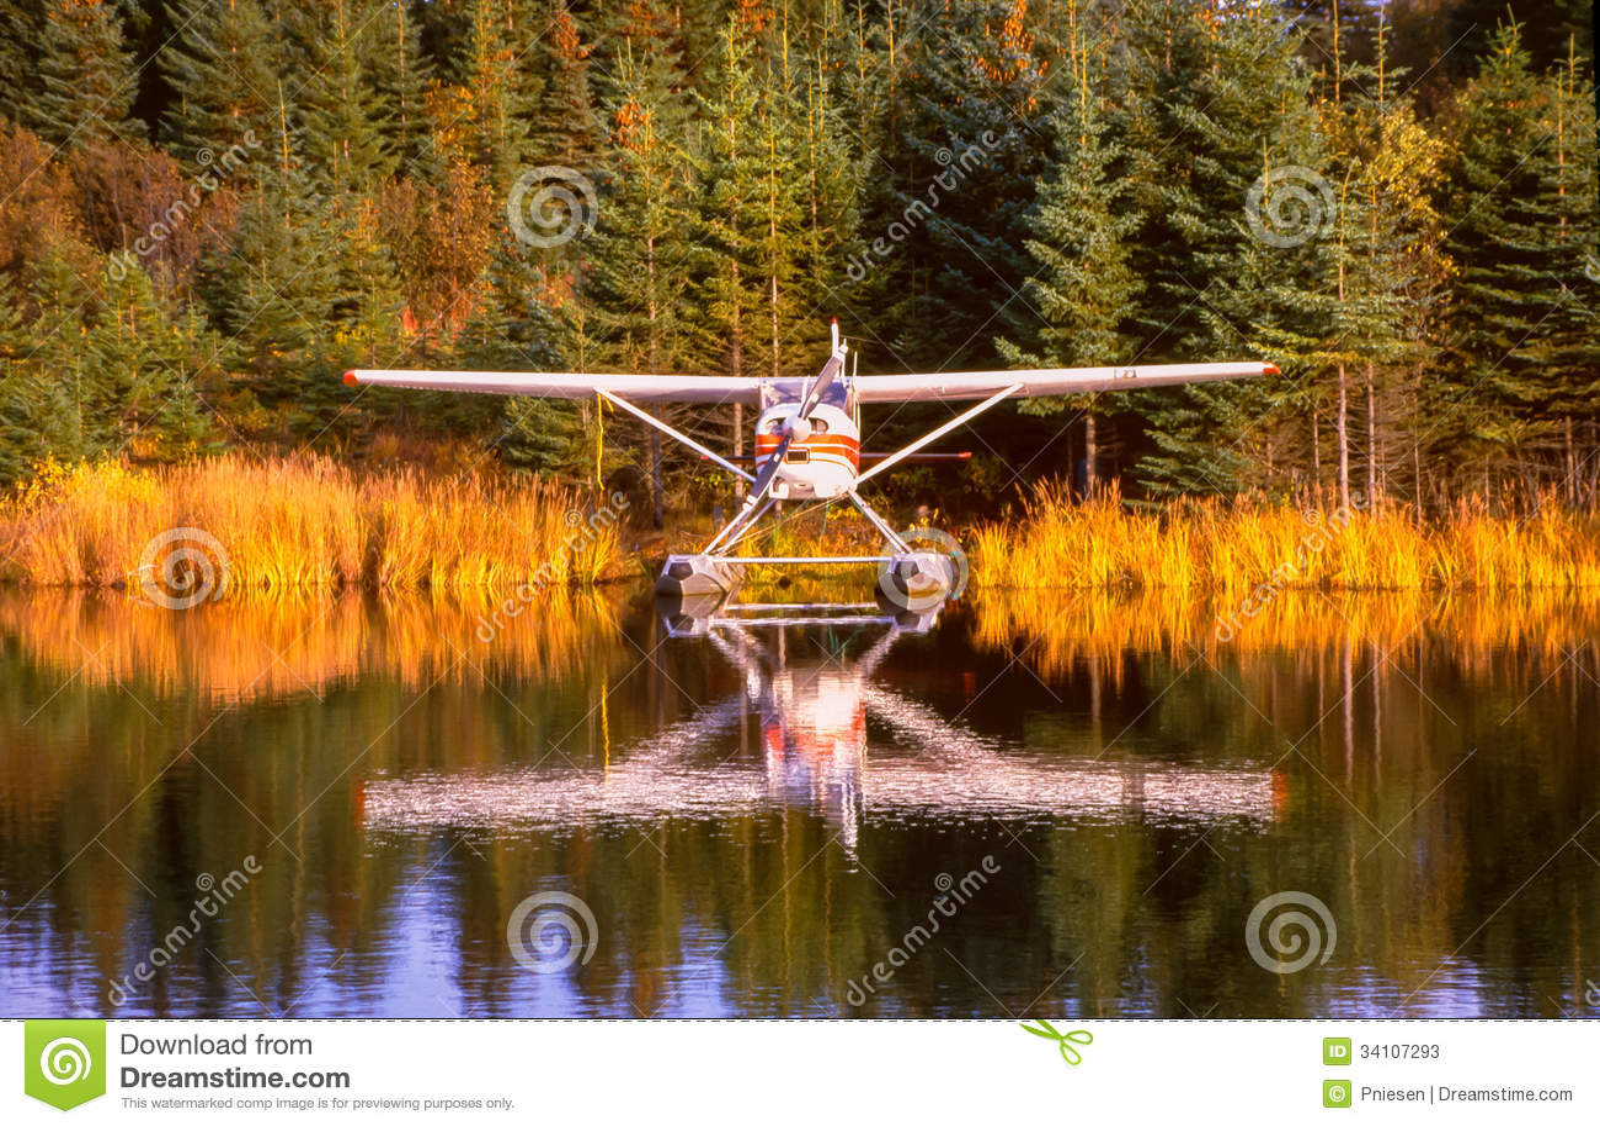 Hd Fall Wallpaper Free Alaska Float Plane Moored At Dock Amid Foliage Reflections